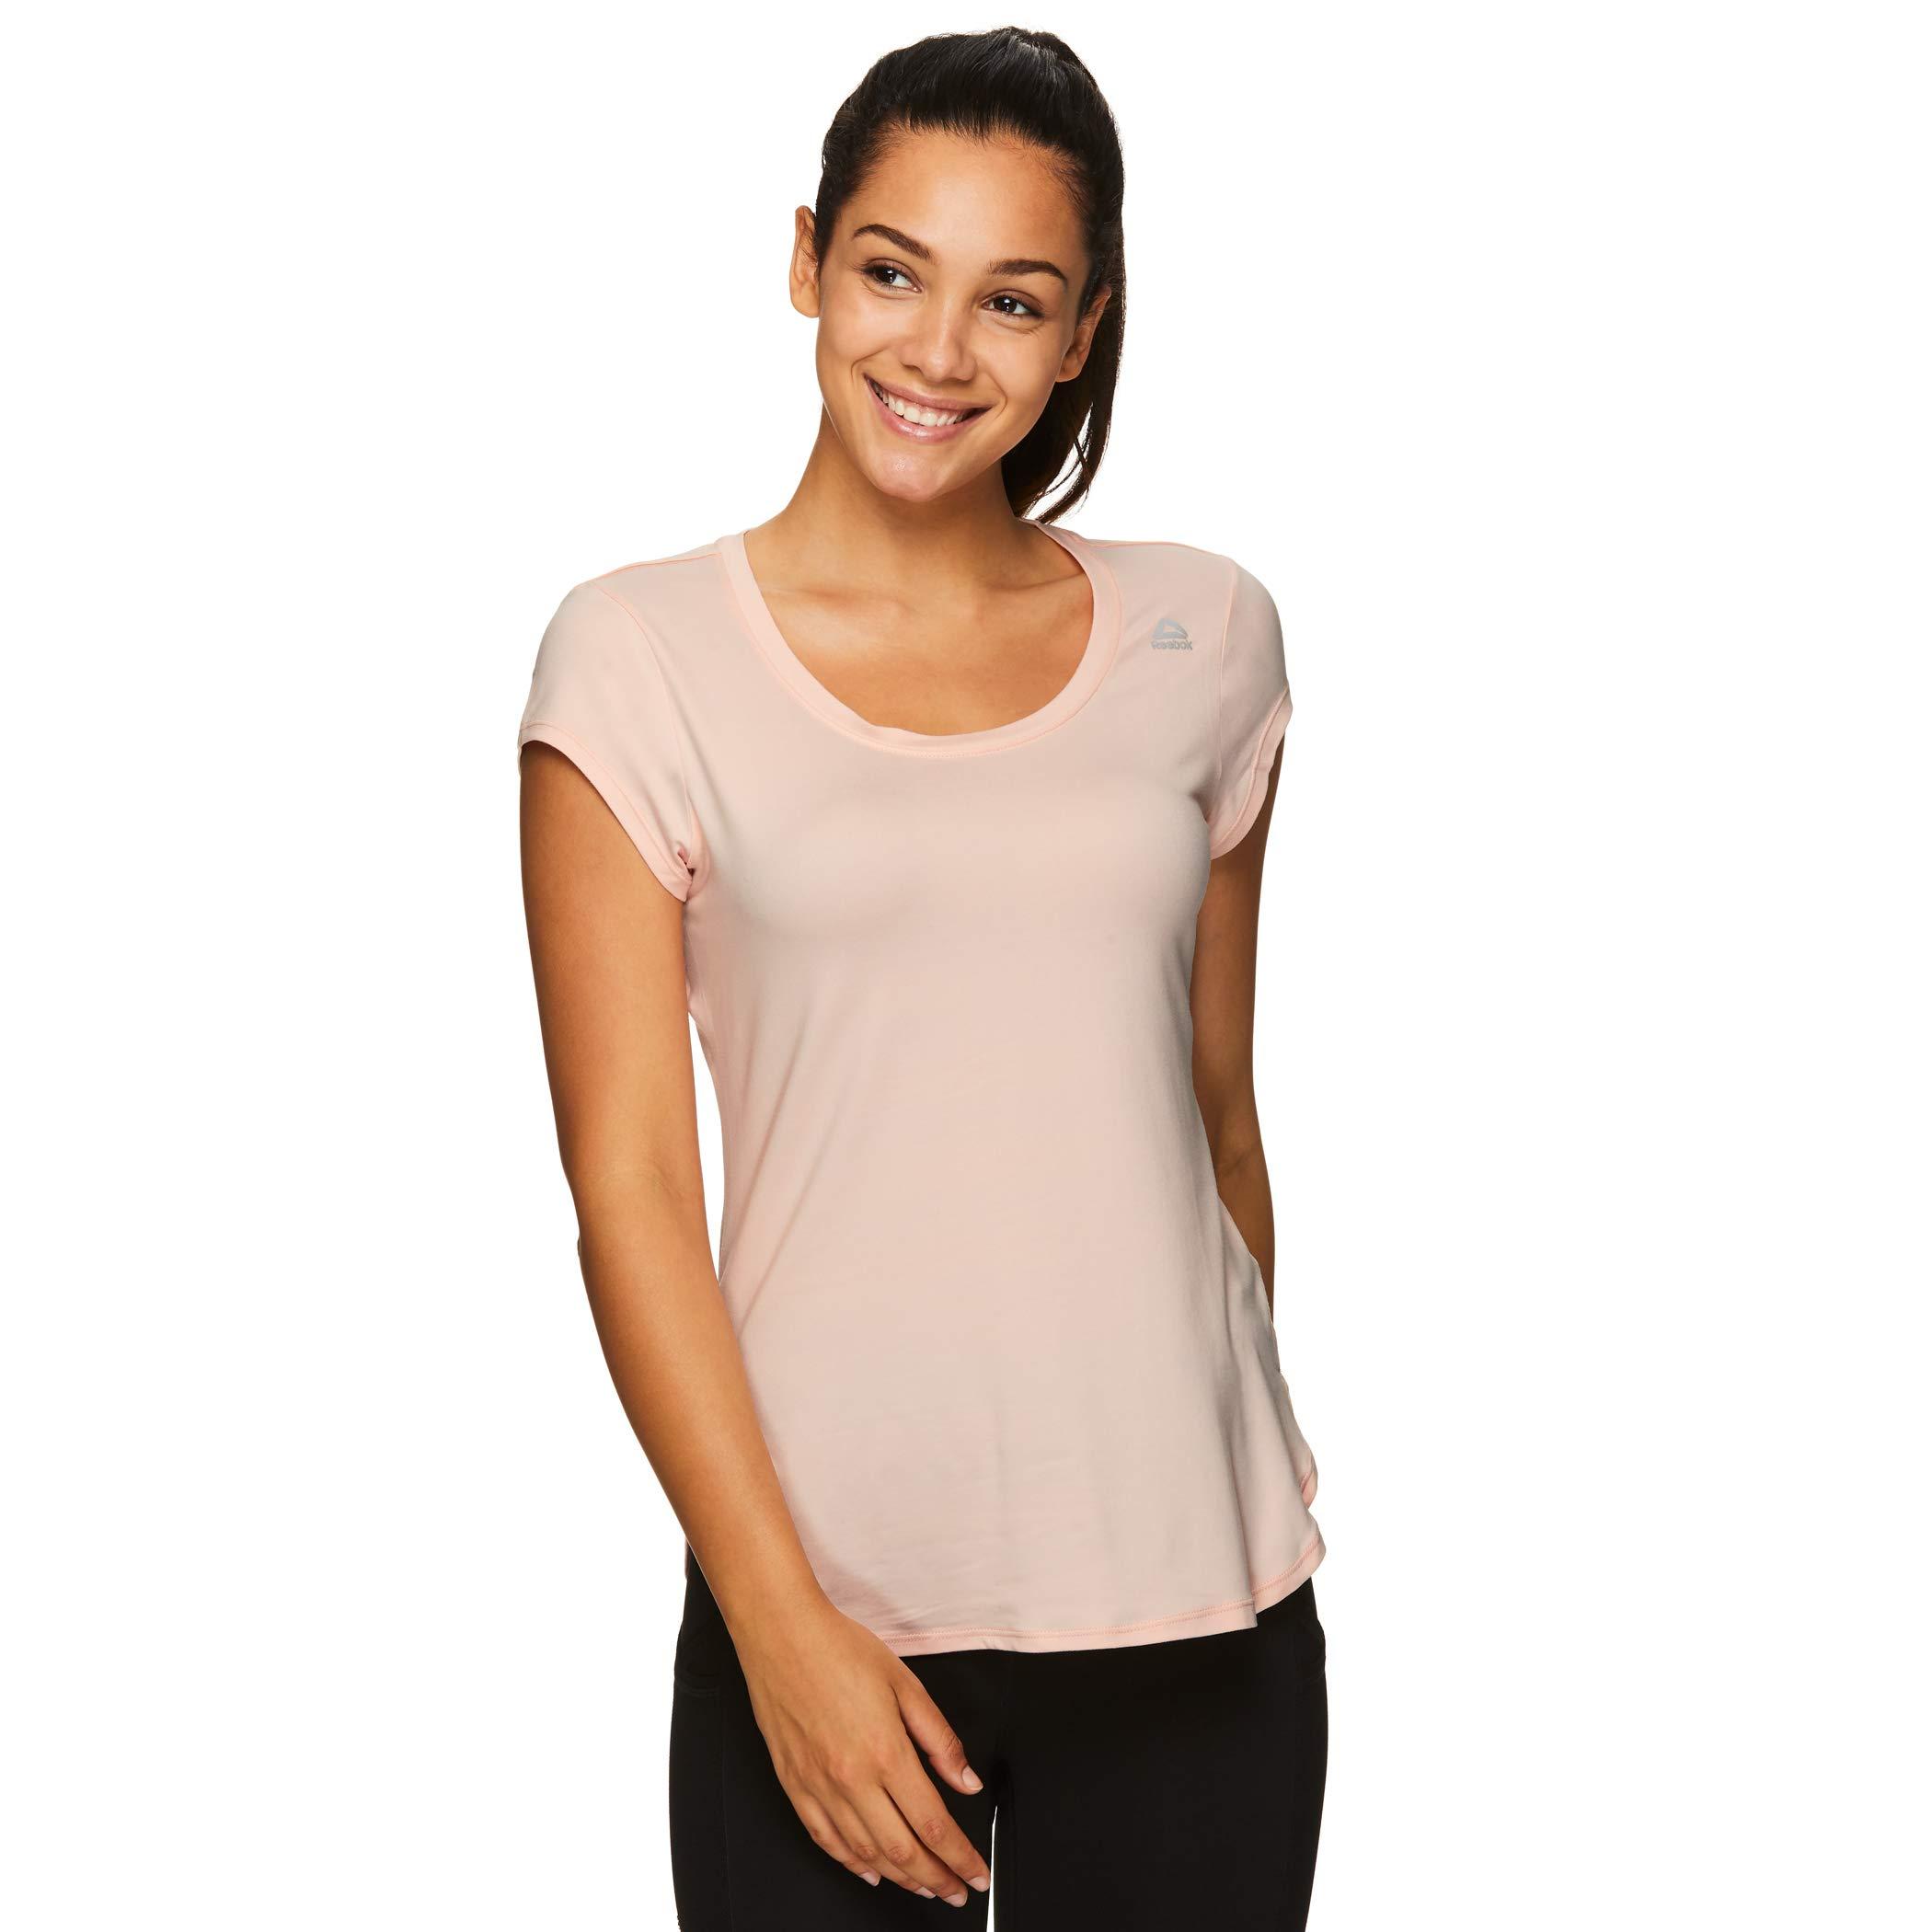 Reebok Women's Legend Performance Top Short Sleeve T-Shirt - Legend SS Impatiens Pink, Small by Reebok